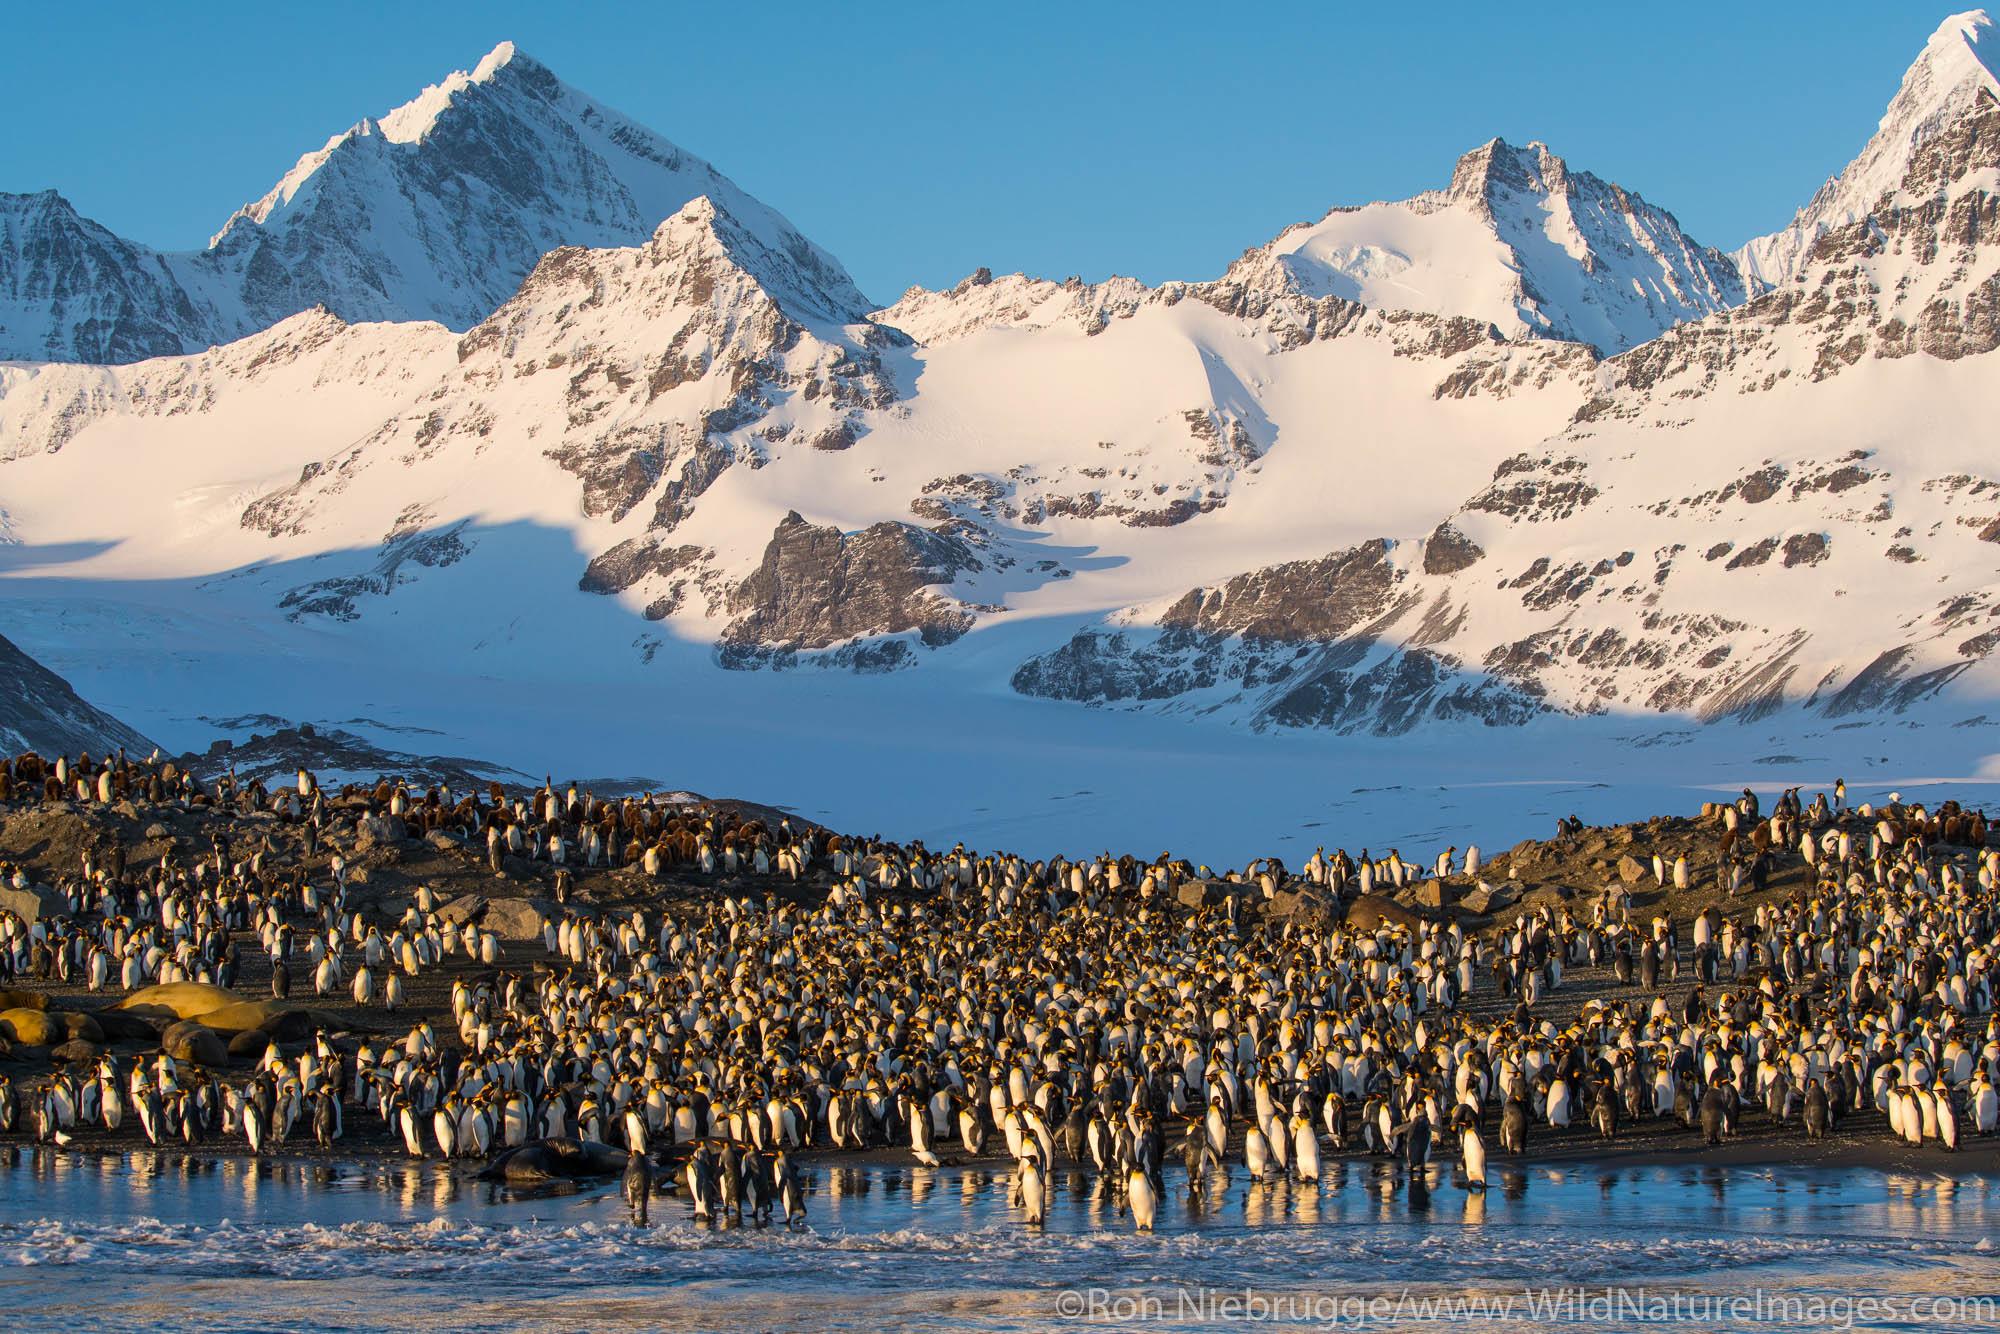 King penguins at St. Andrews Bay, South Georgia, Antarctica.